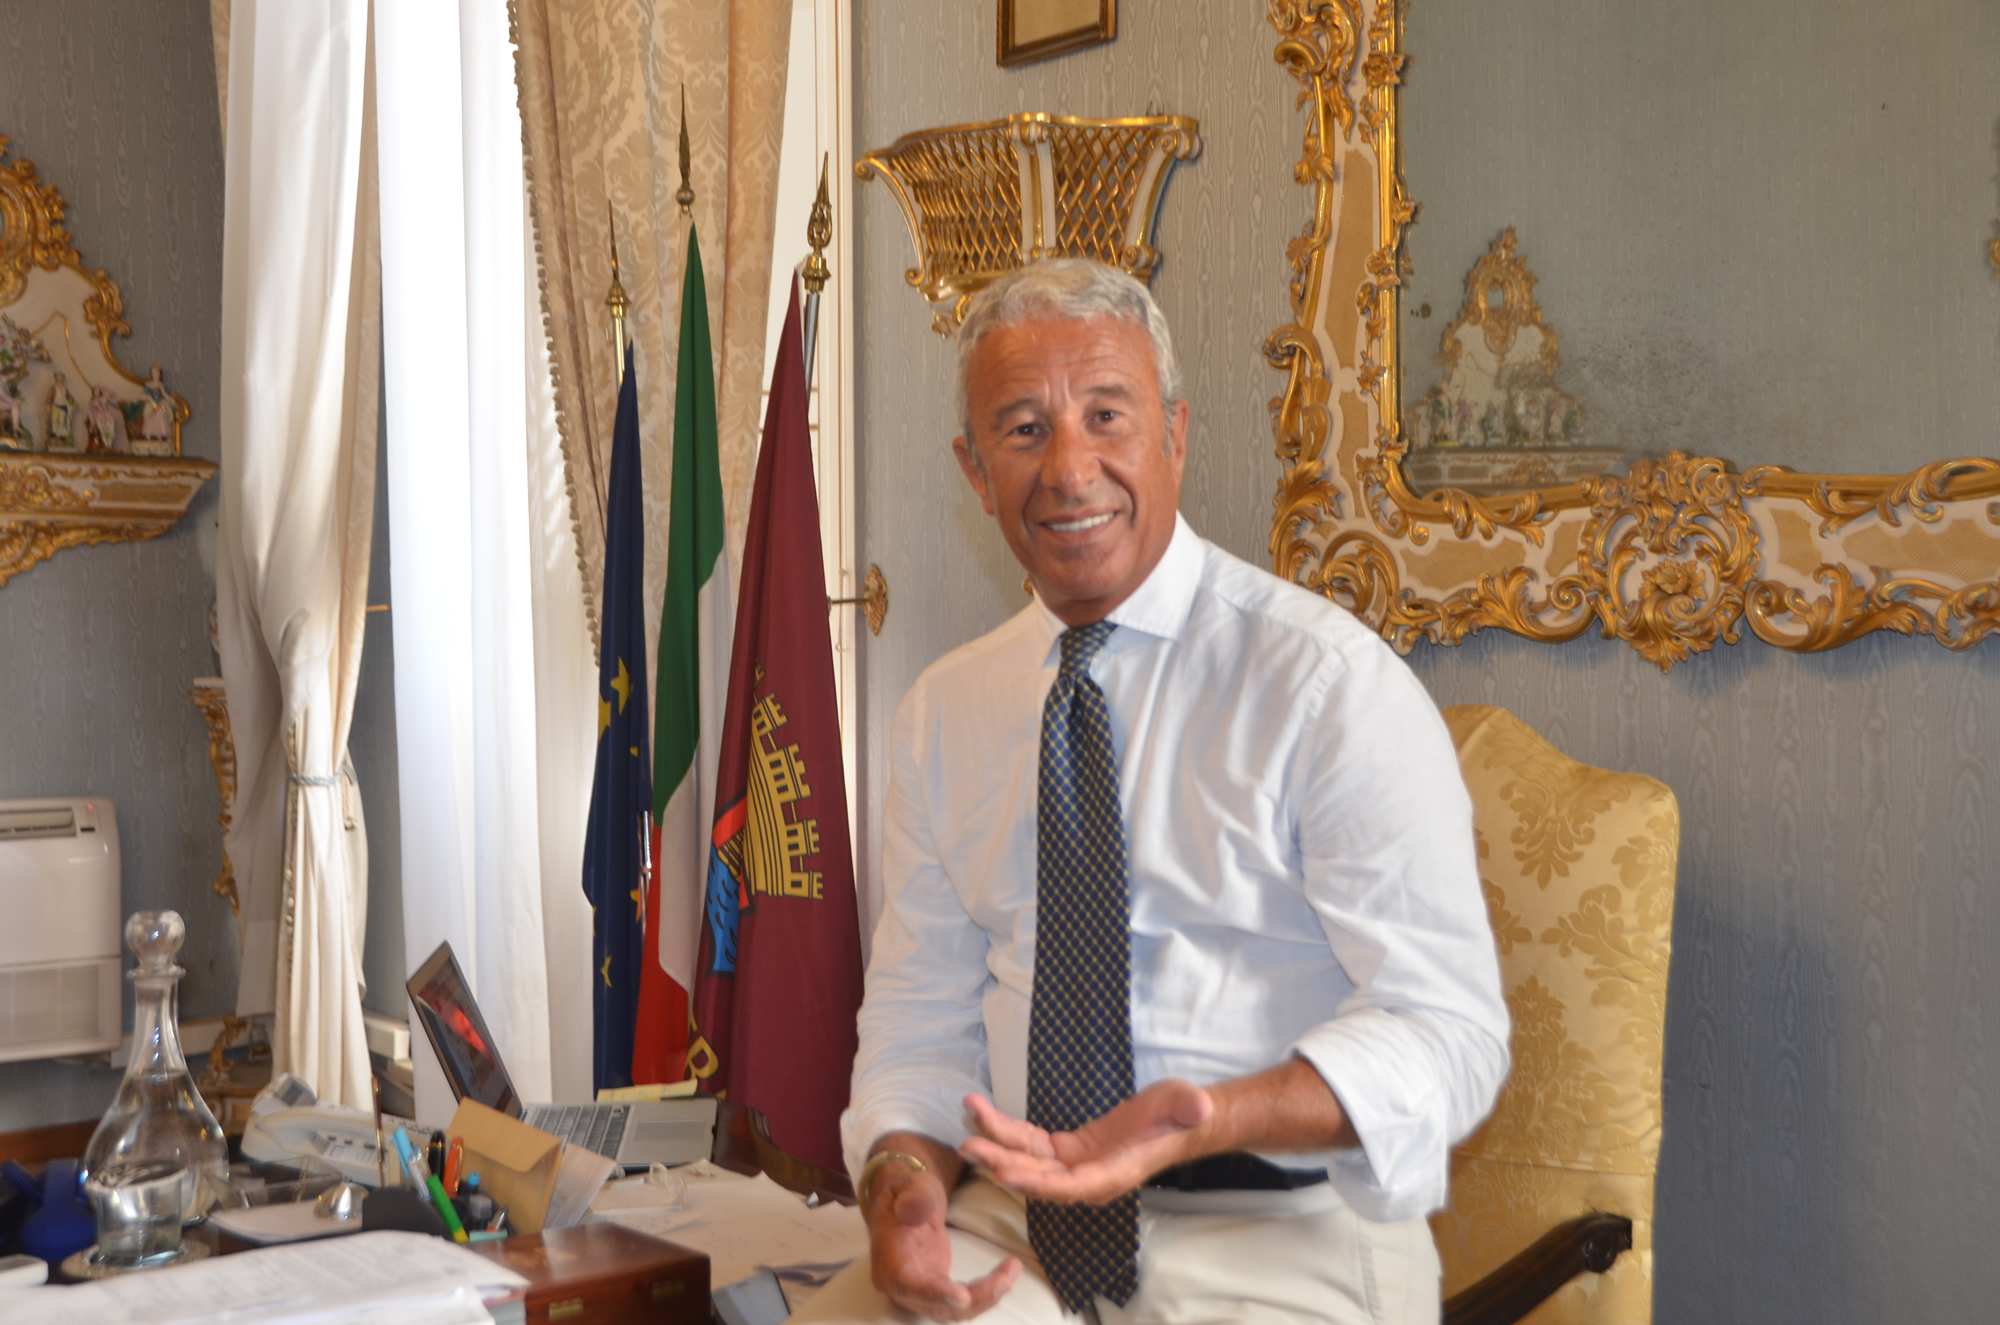 Vito Damiano